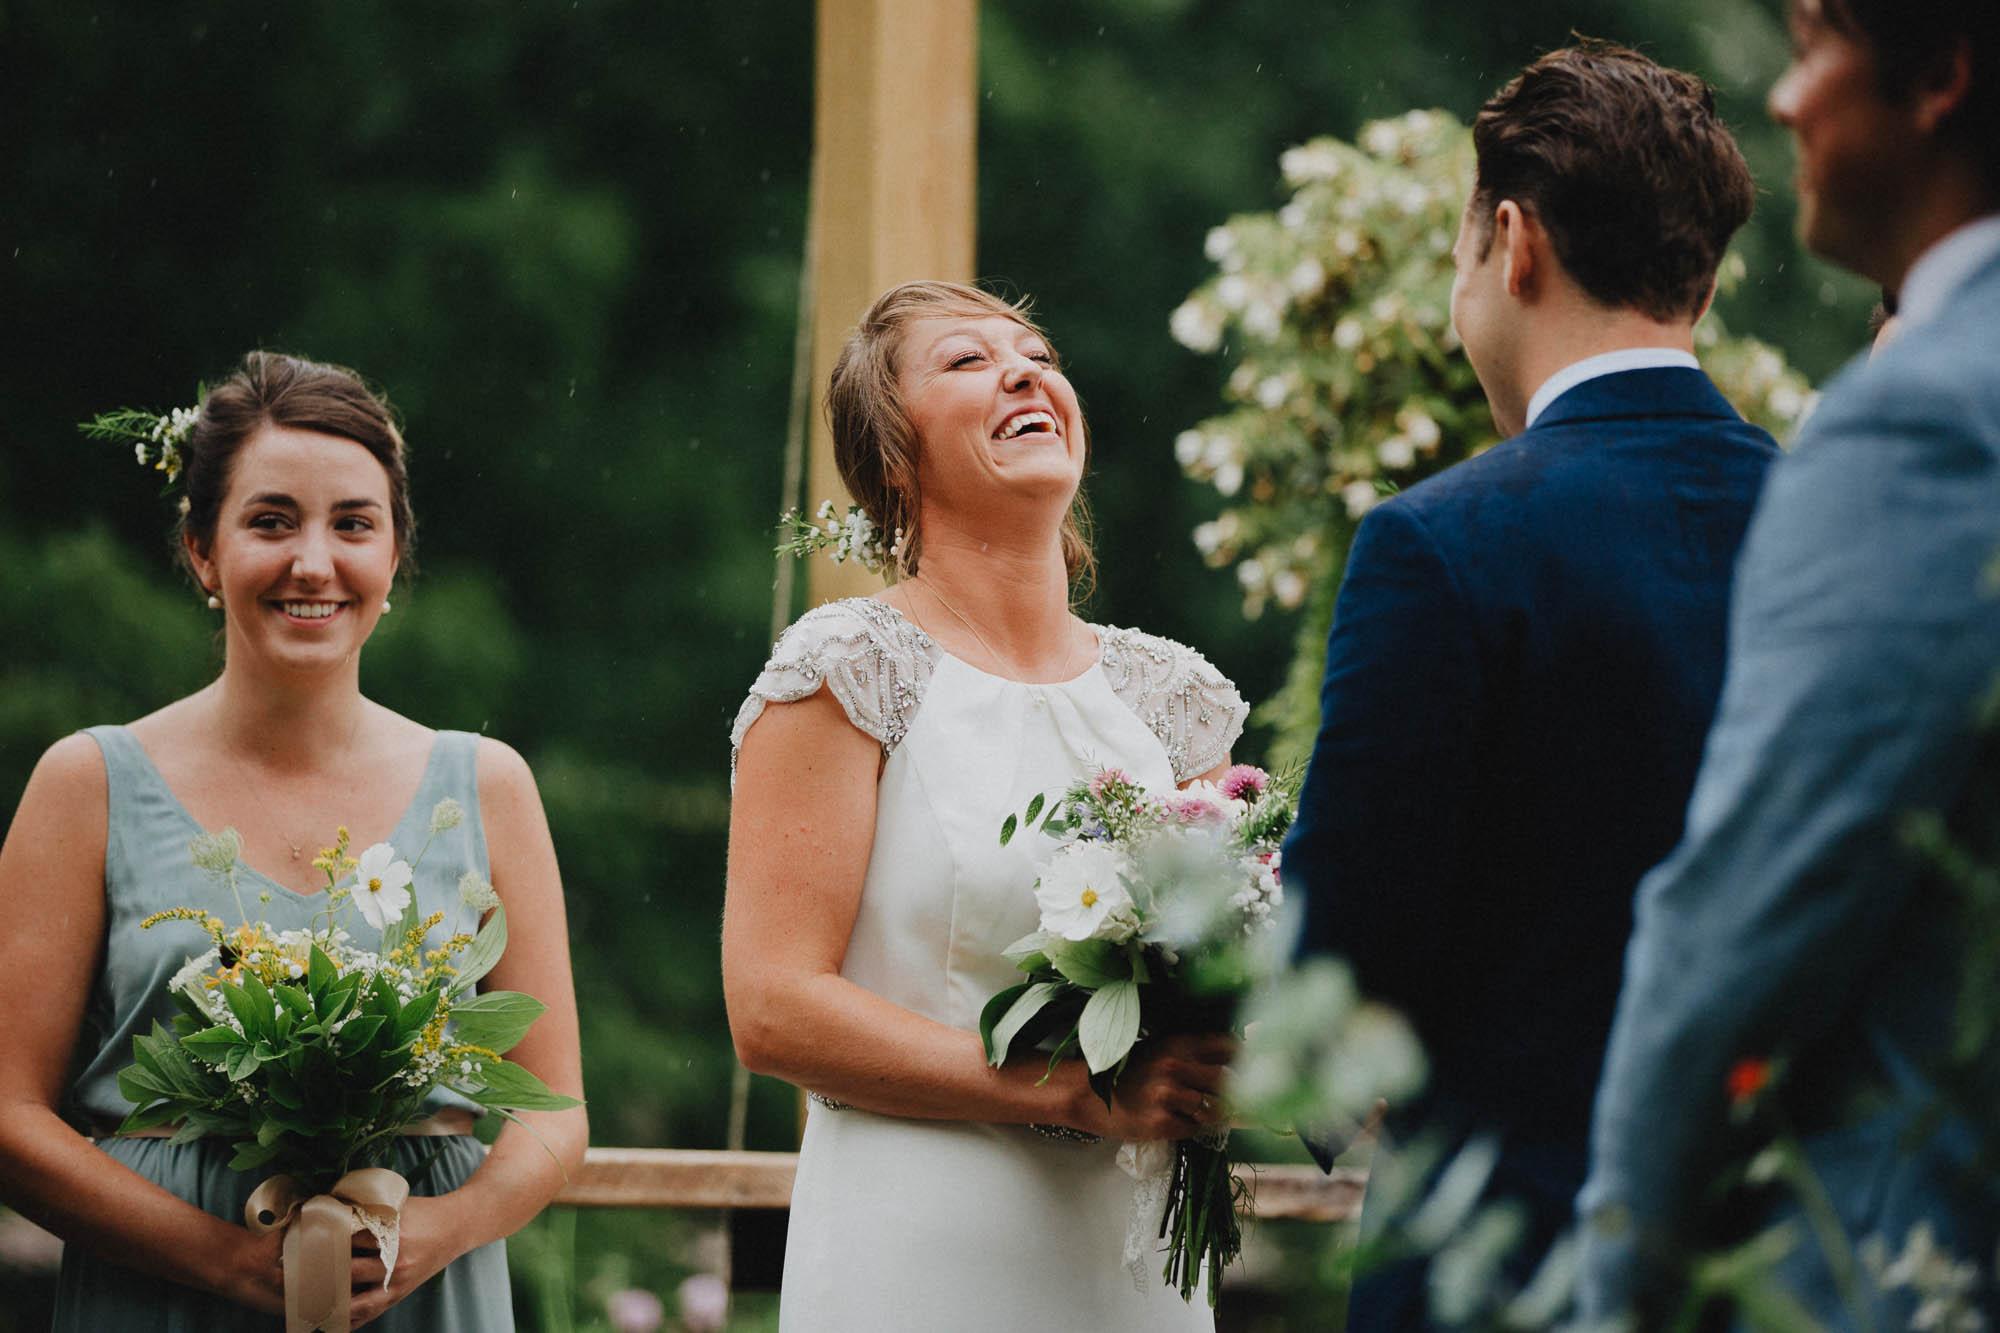 Leah-Graham-Michigan-Outdoor-DIY-Wedding-048@2x.jpg